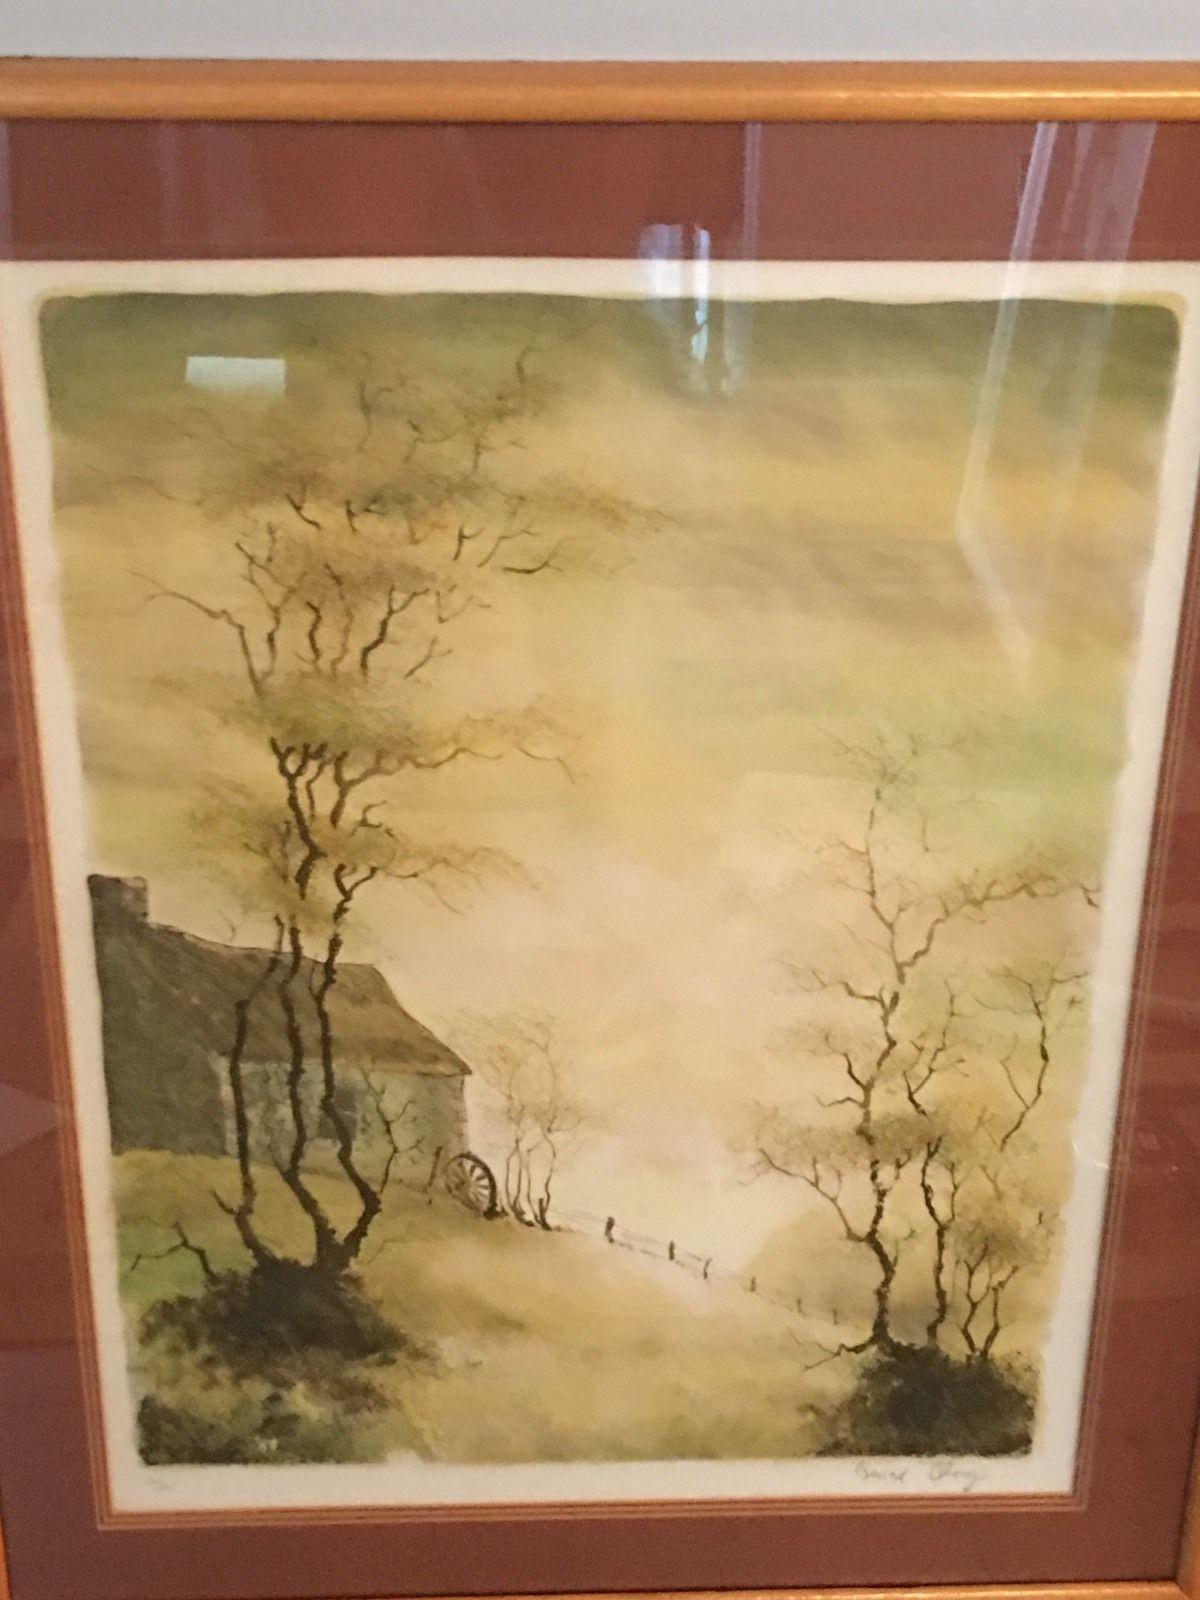 For sale we have a framed, artist signed print. Signed in lower ...